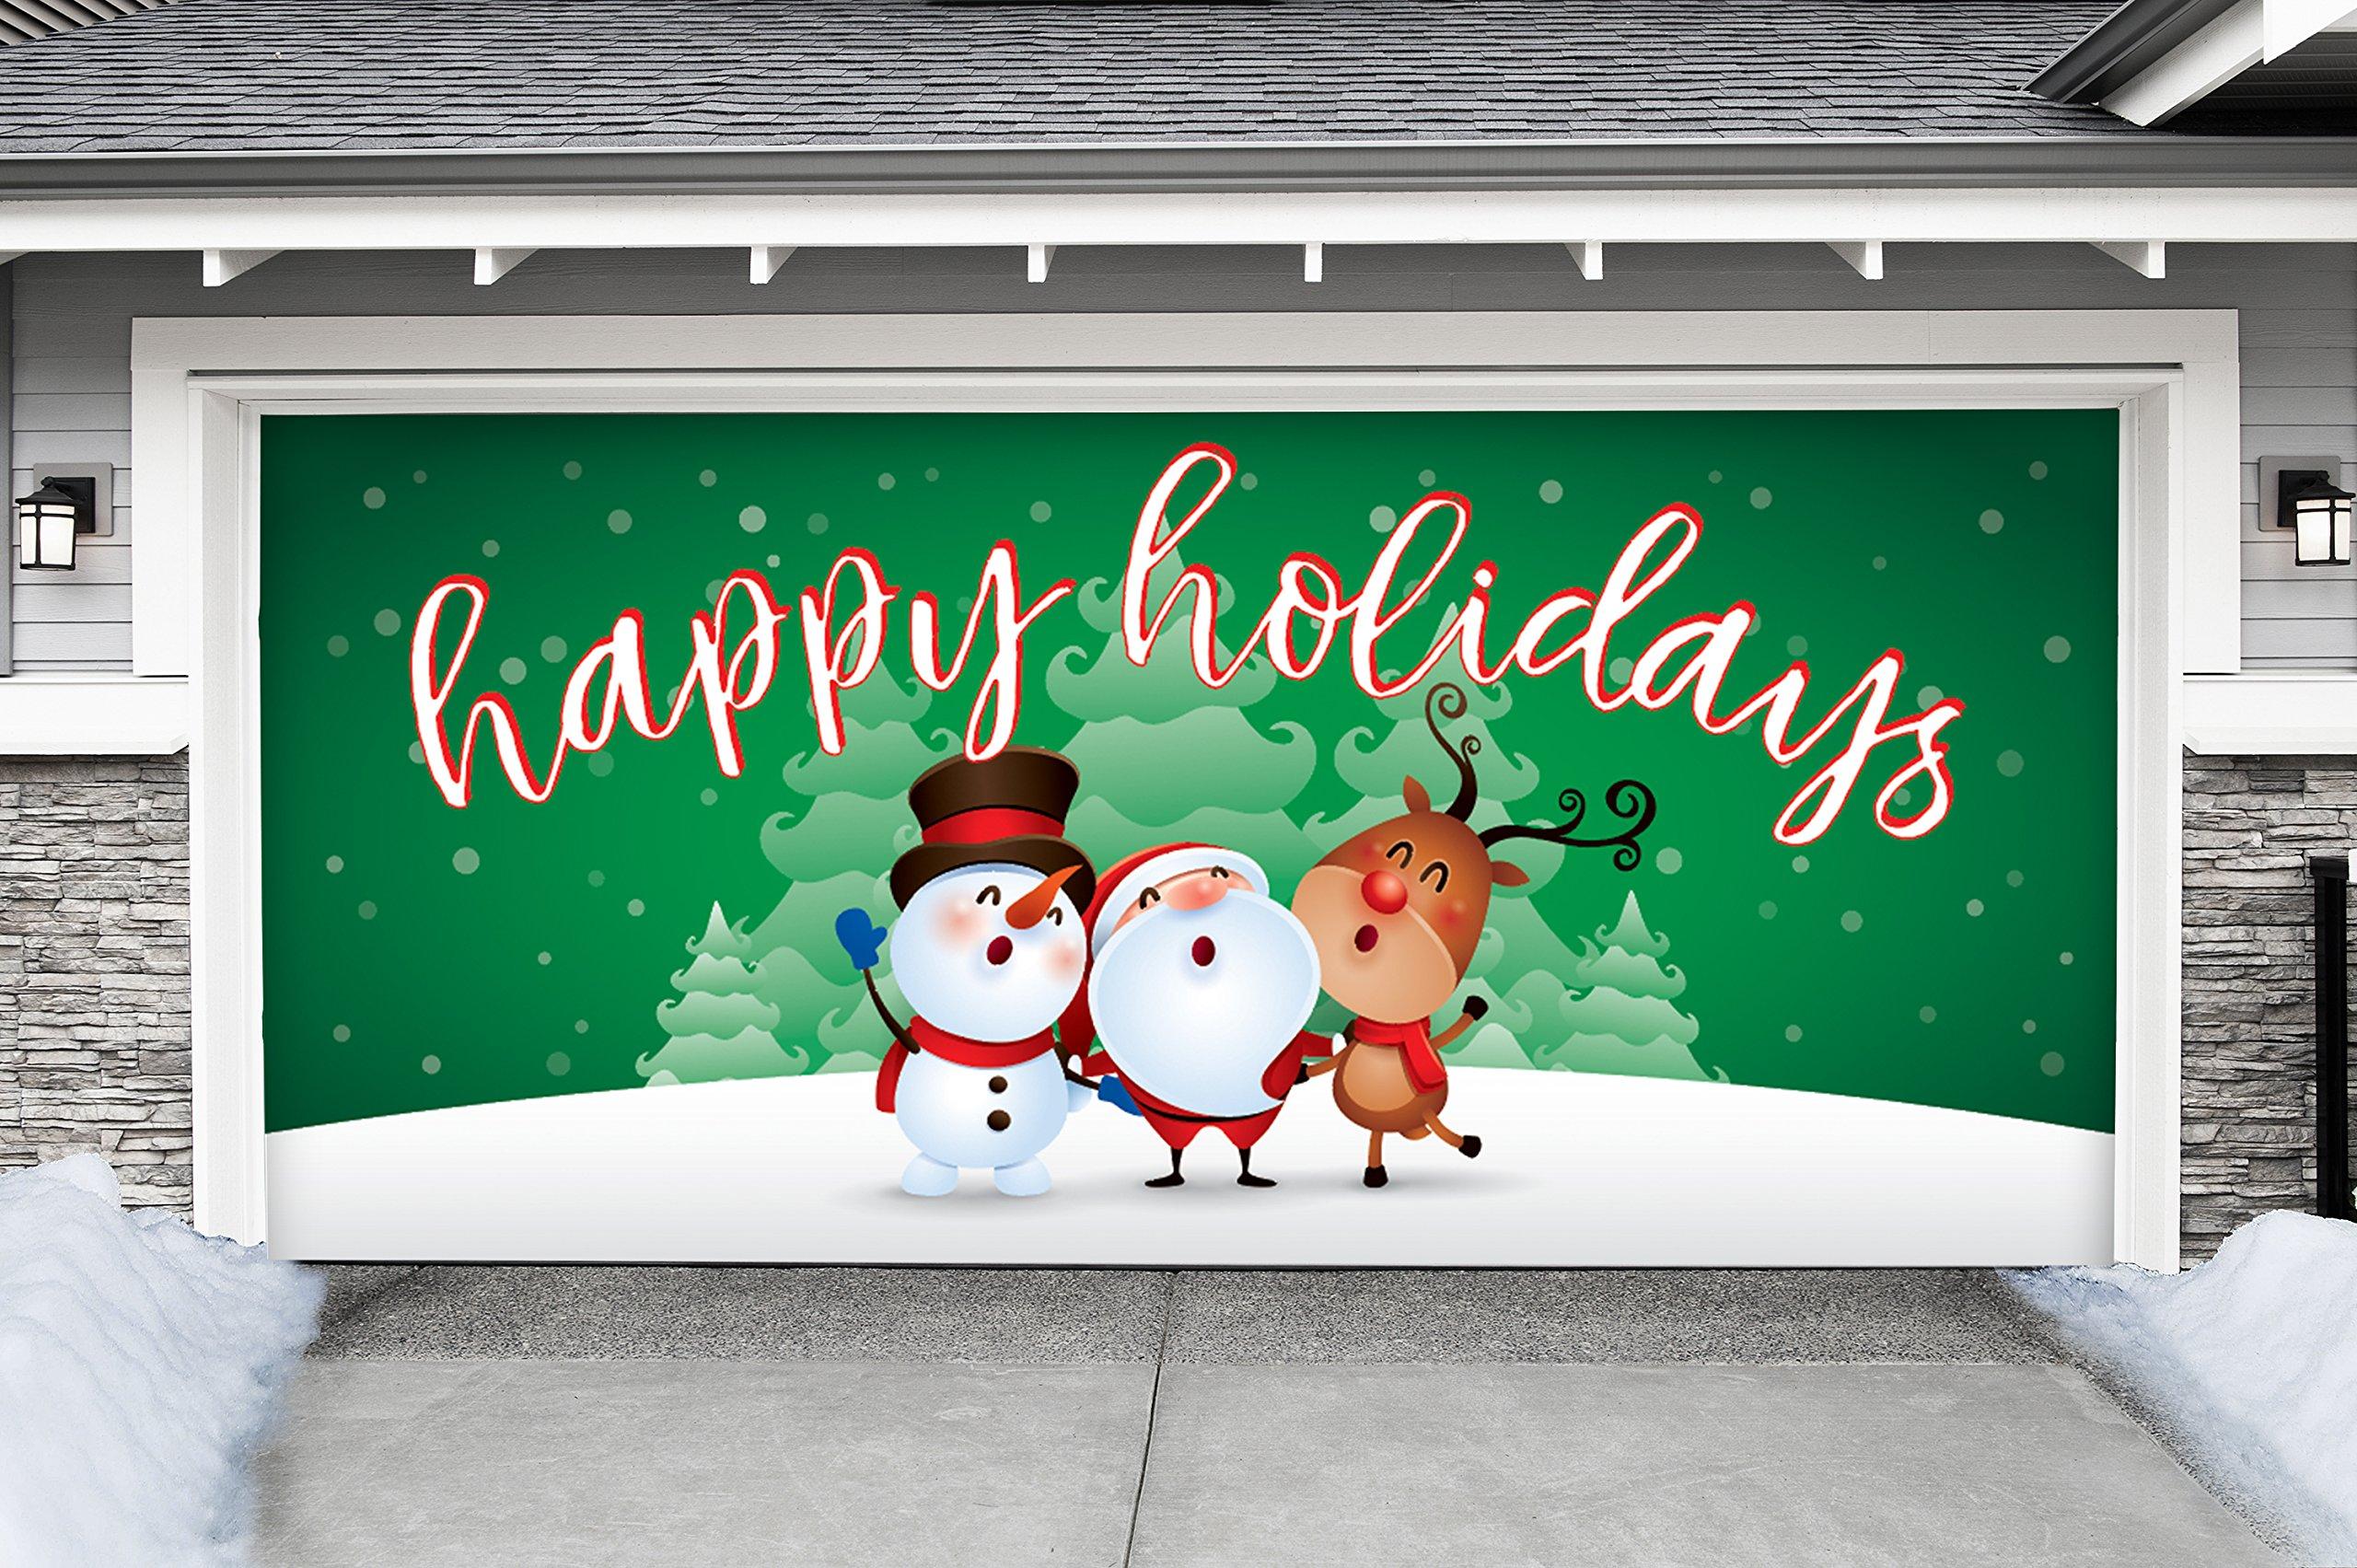 Outdoor Christmas Holiday Garage Door Banner Cover Mural Décoration - Christmas Characters Happy Holidays Winter - Outdoor Christmas Holiday Garage Door Banner Décor Sign 7'x16'